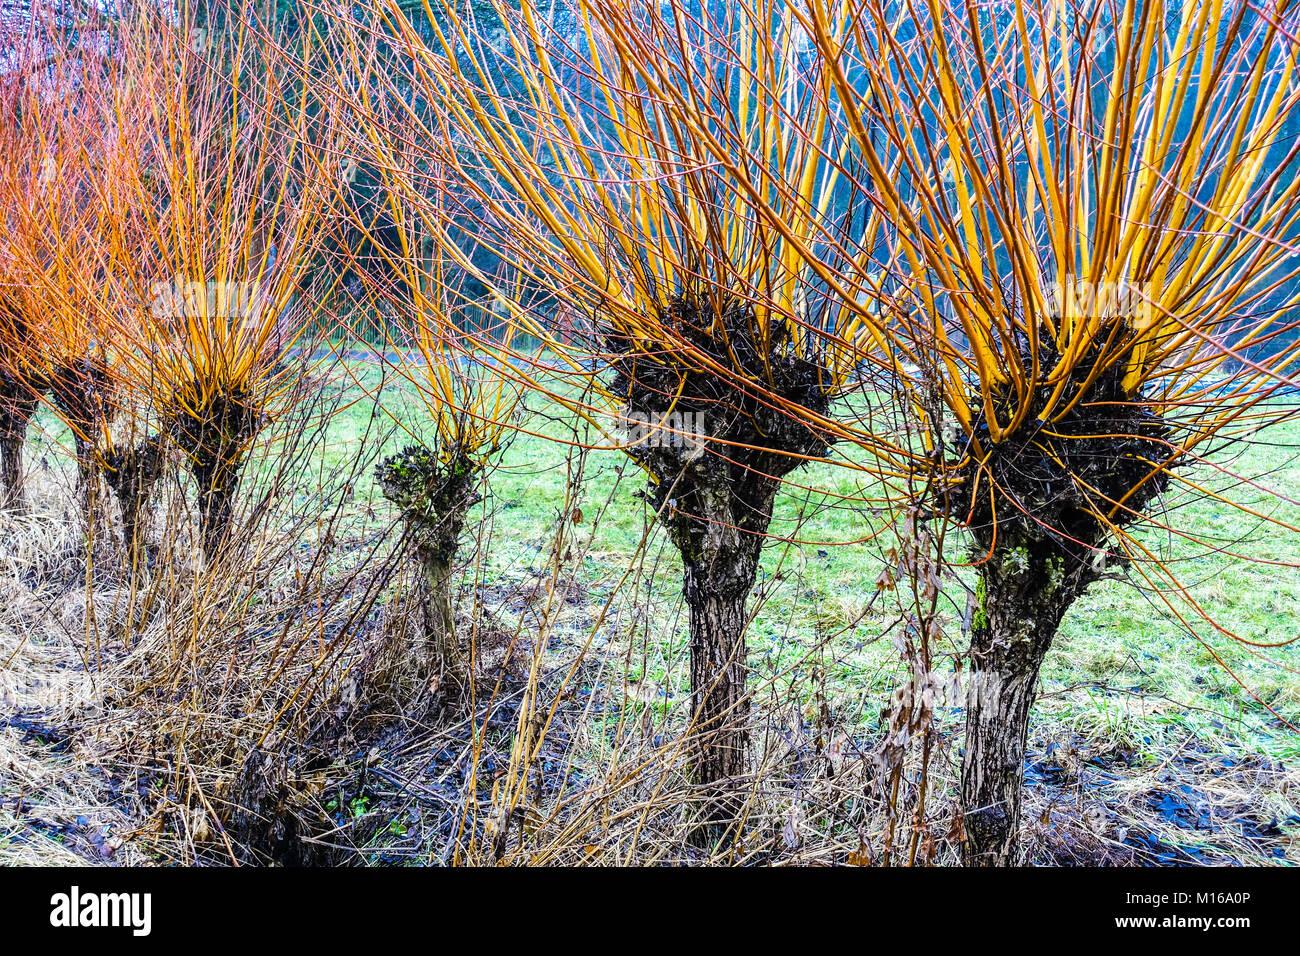 Osier, Salix viminalis, pollard willows, used for basketry - Stock Image